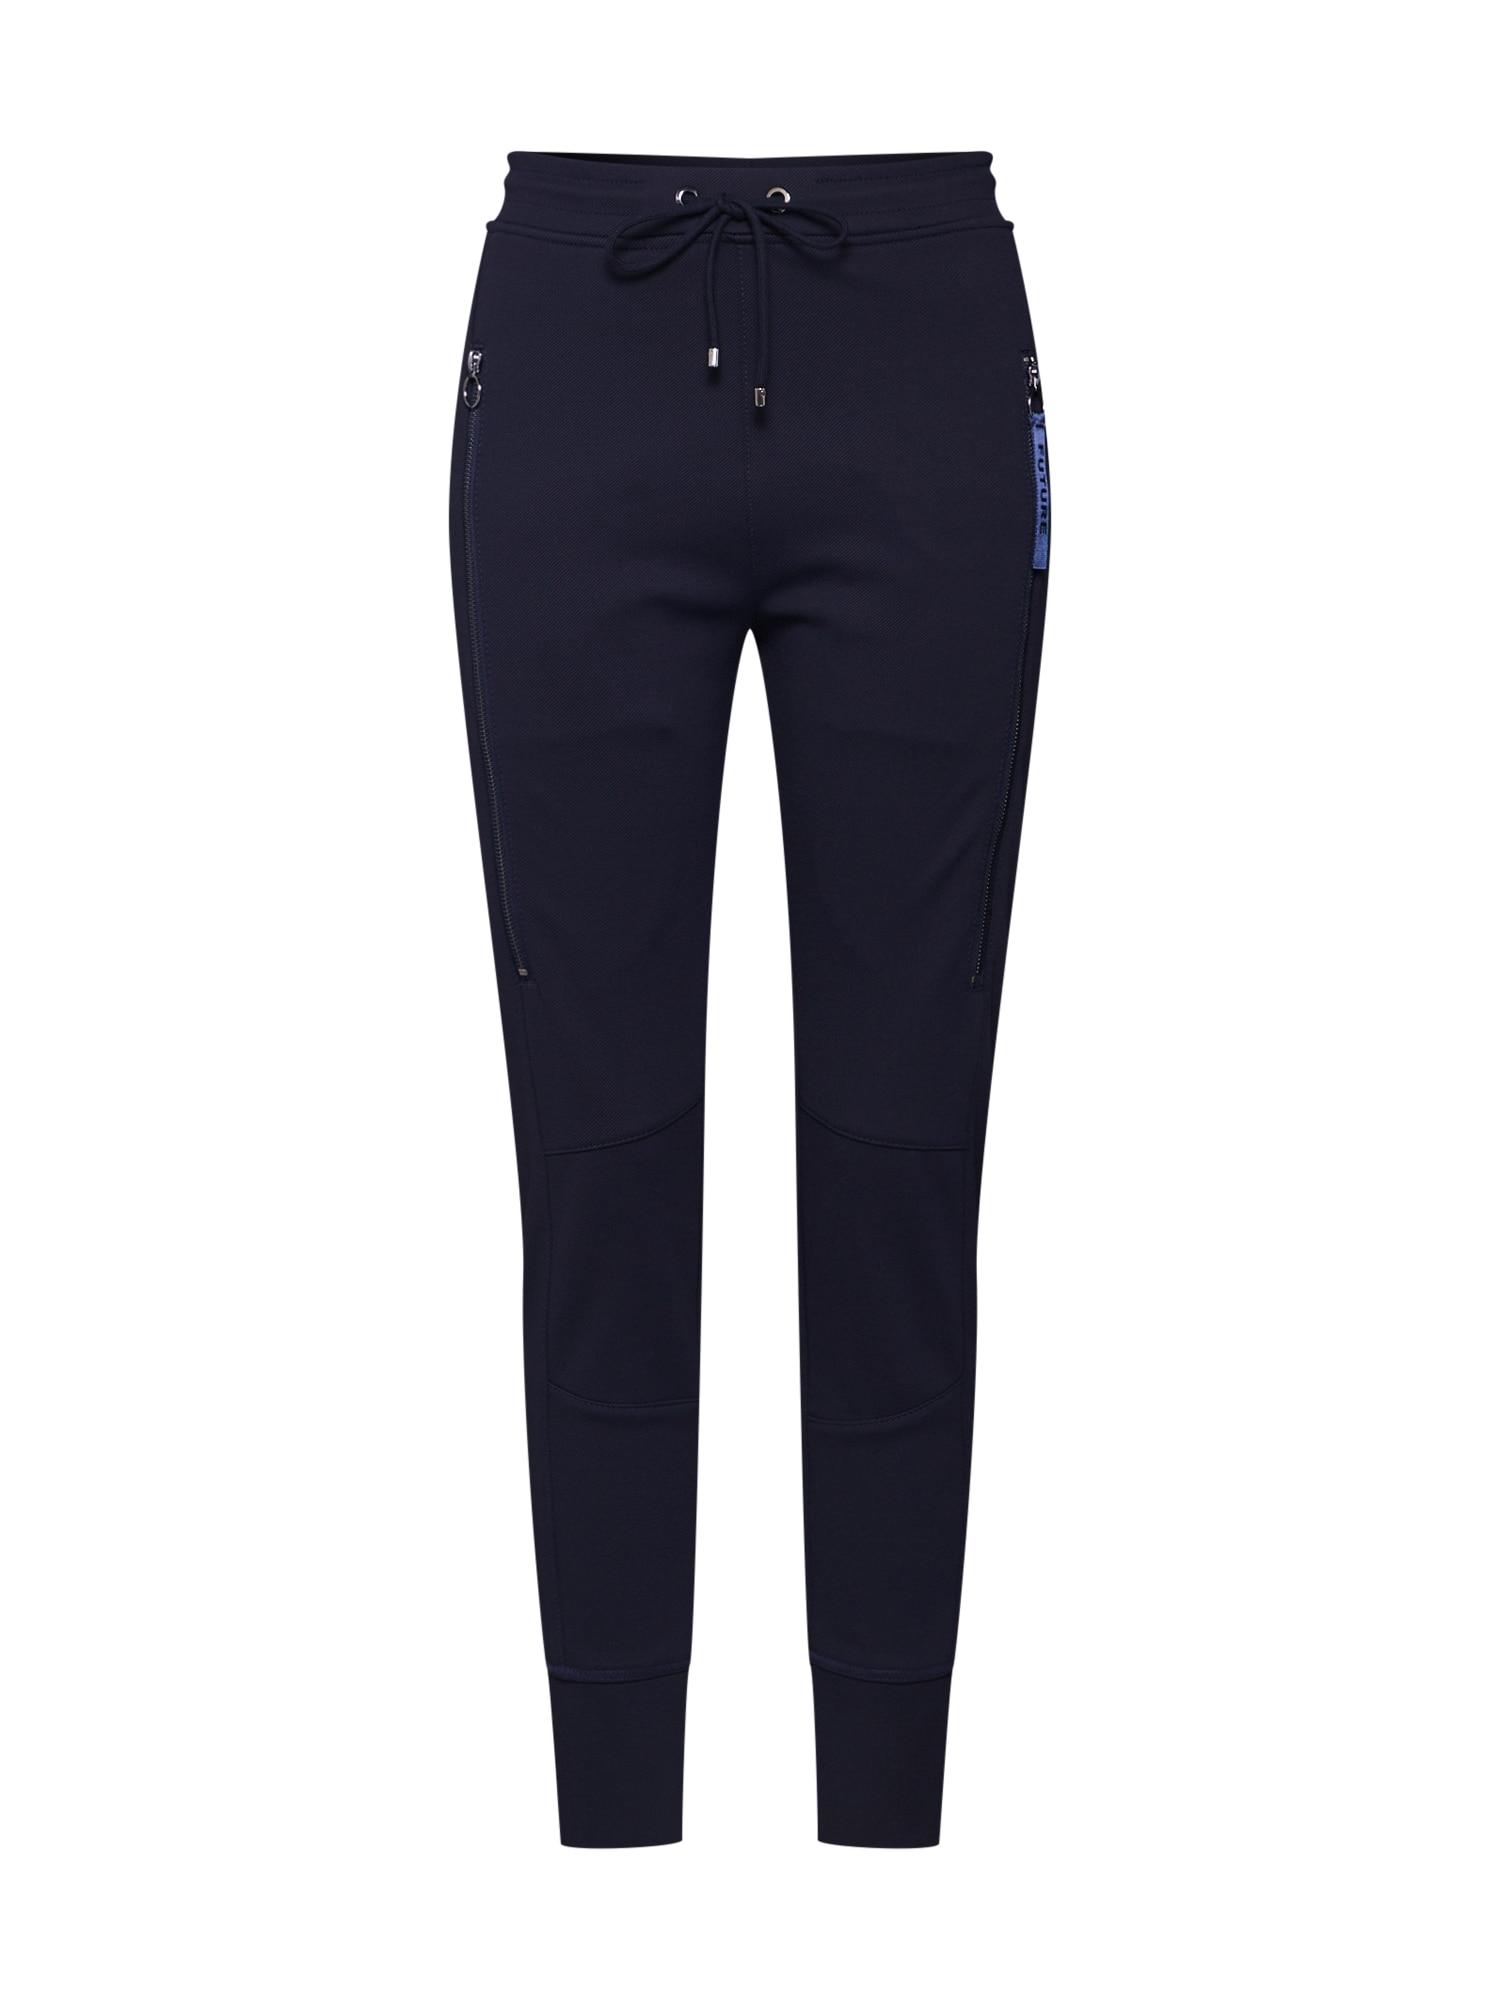 Kalhoty FUTURE 2.0 tmavě modrá MAC